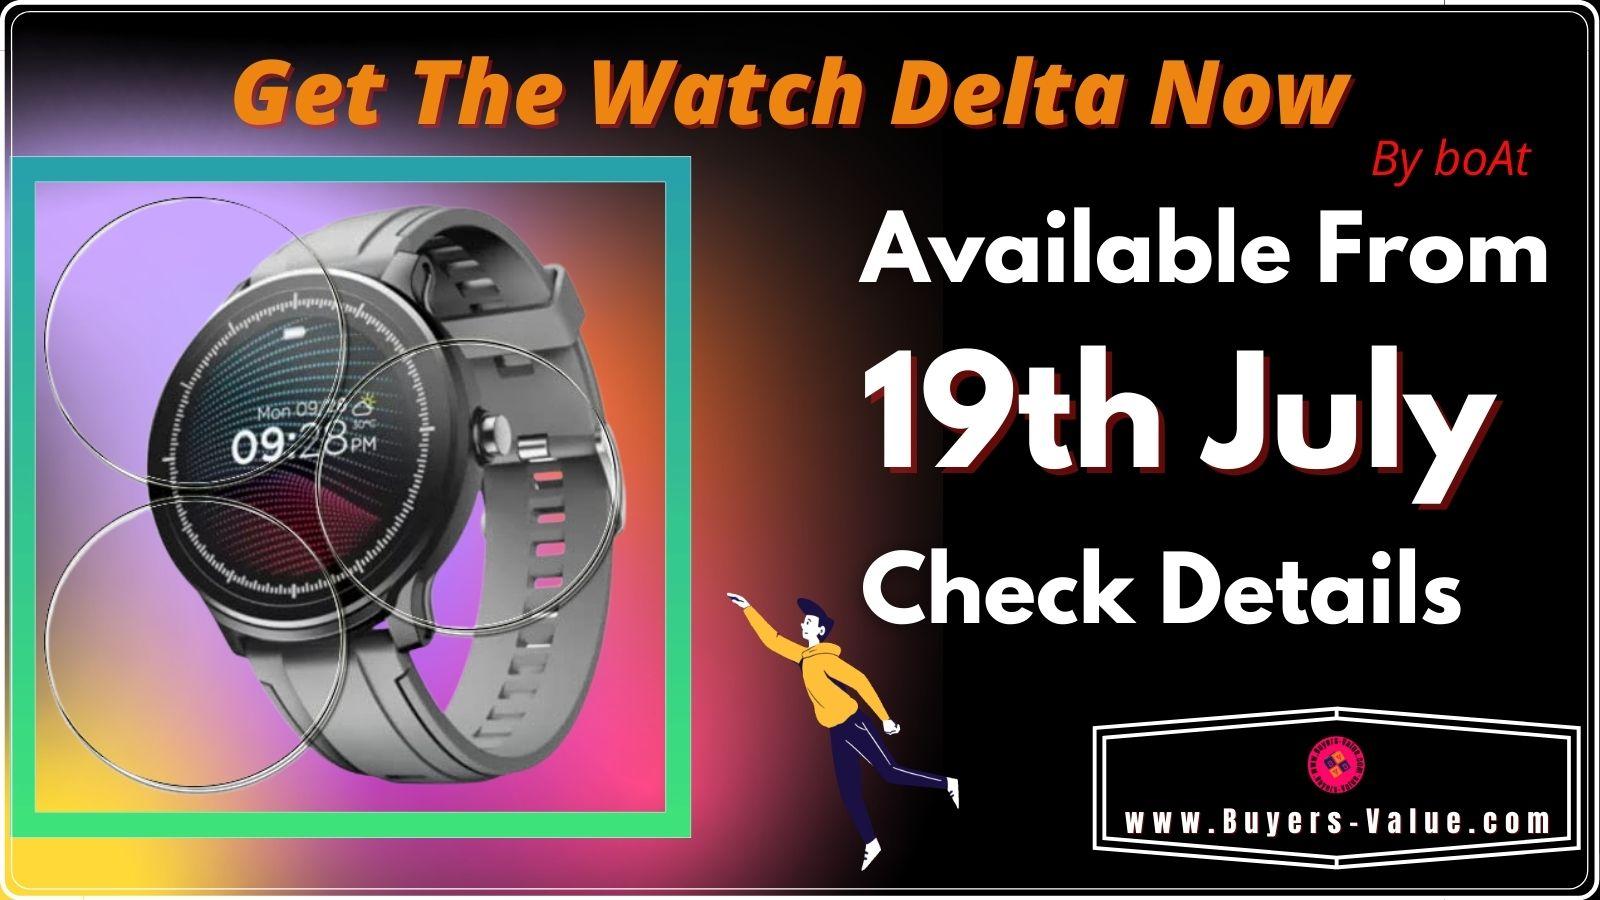 Get The Delta Watch Now